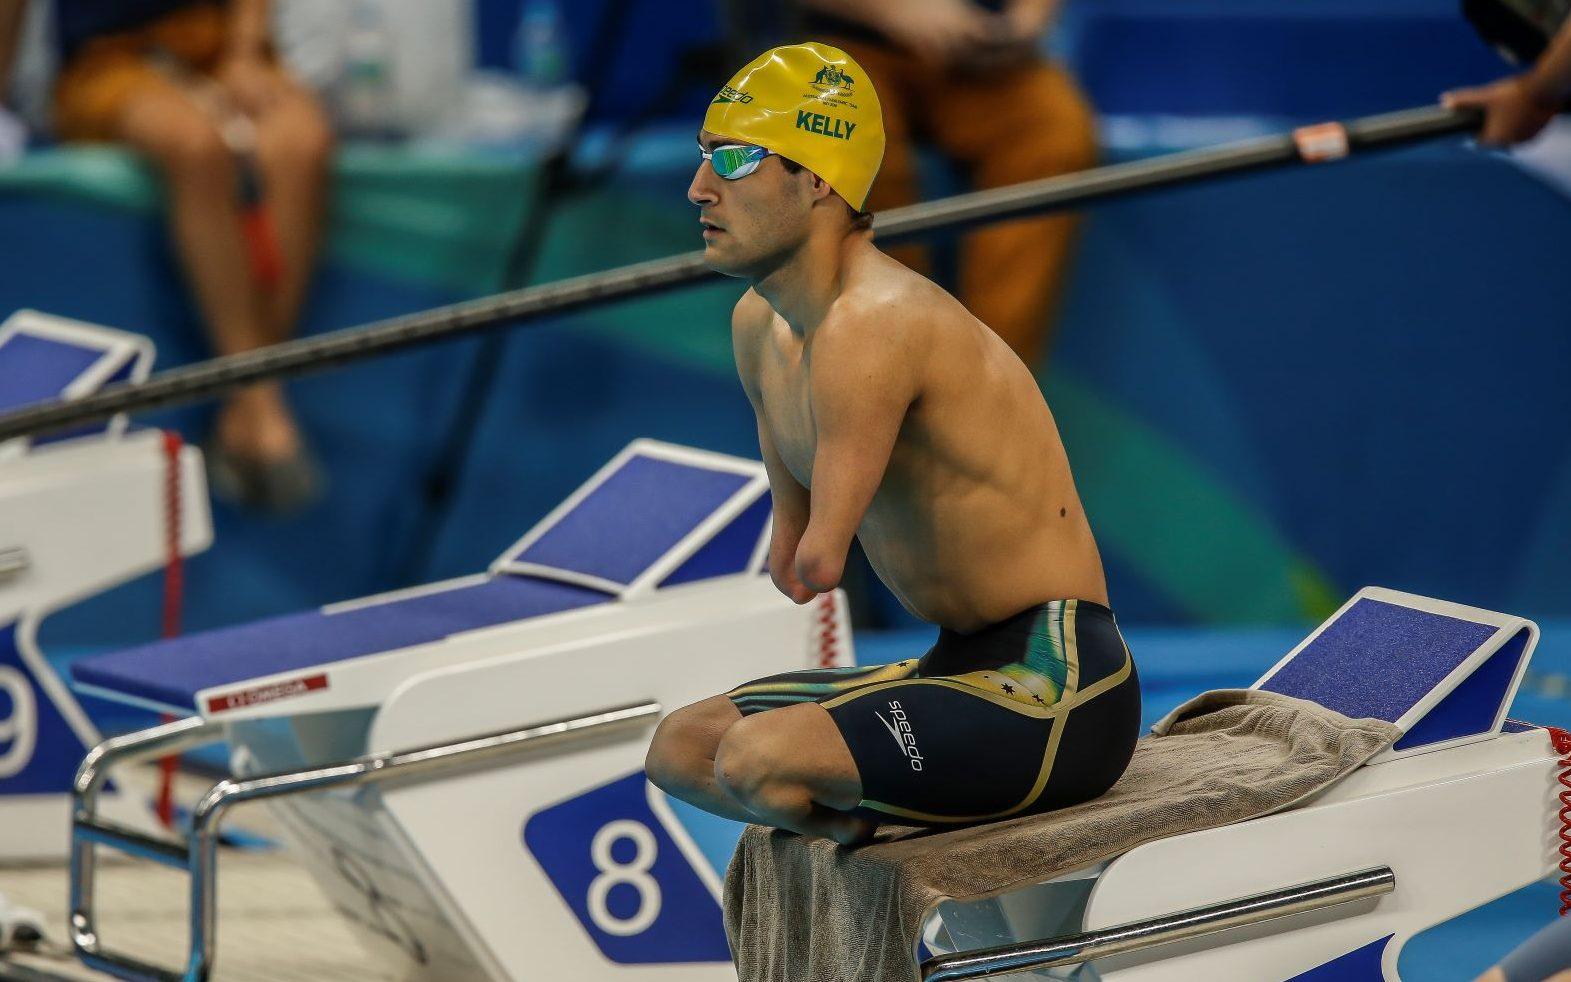 IPC strip Malaysia of 2019 World Para-swimming Championships